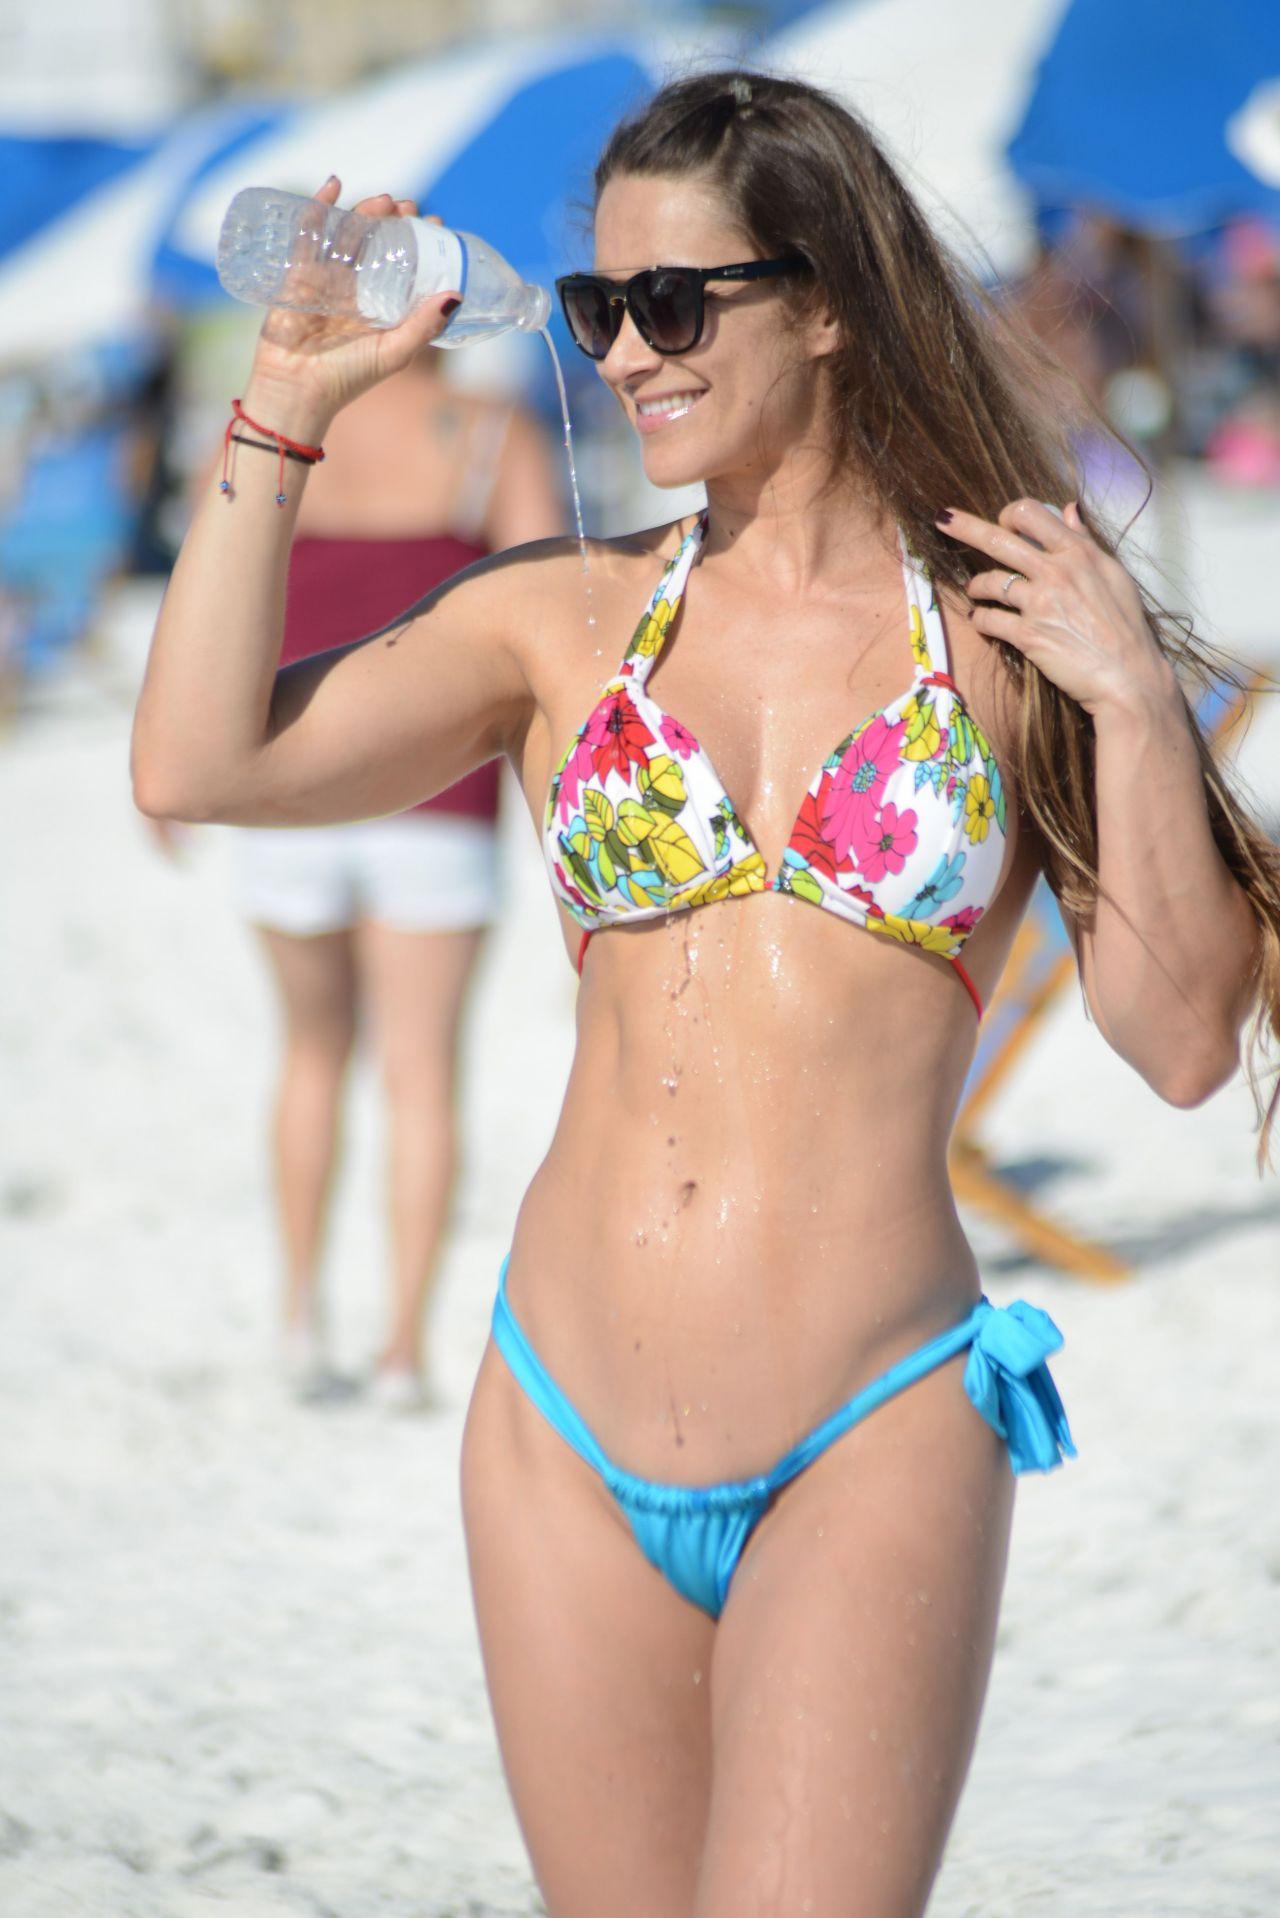 Anais Zanotti Hot anais zanotti and nicole cardia hot in bikini - miami beach